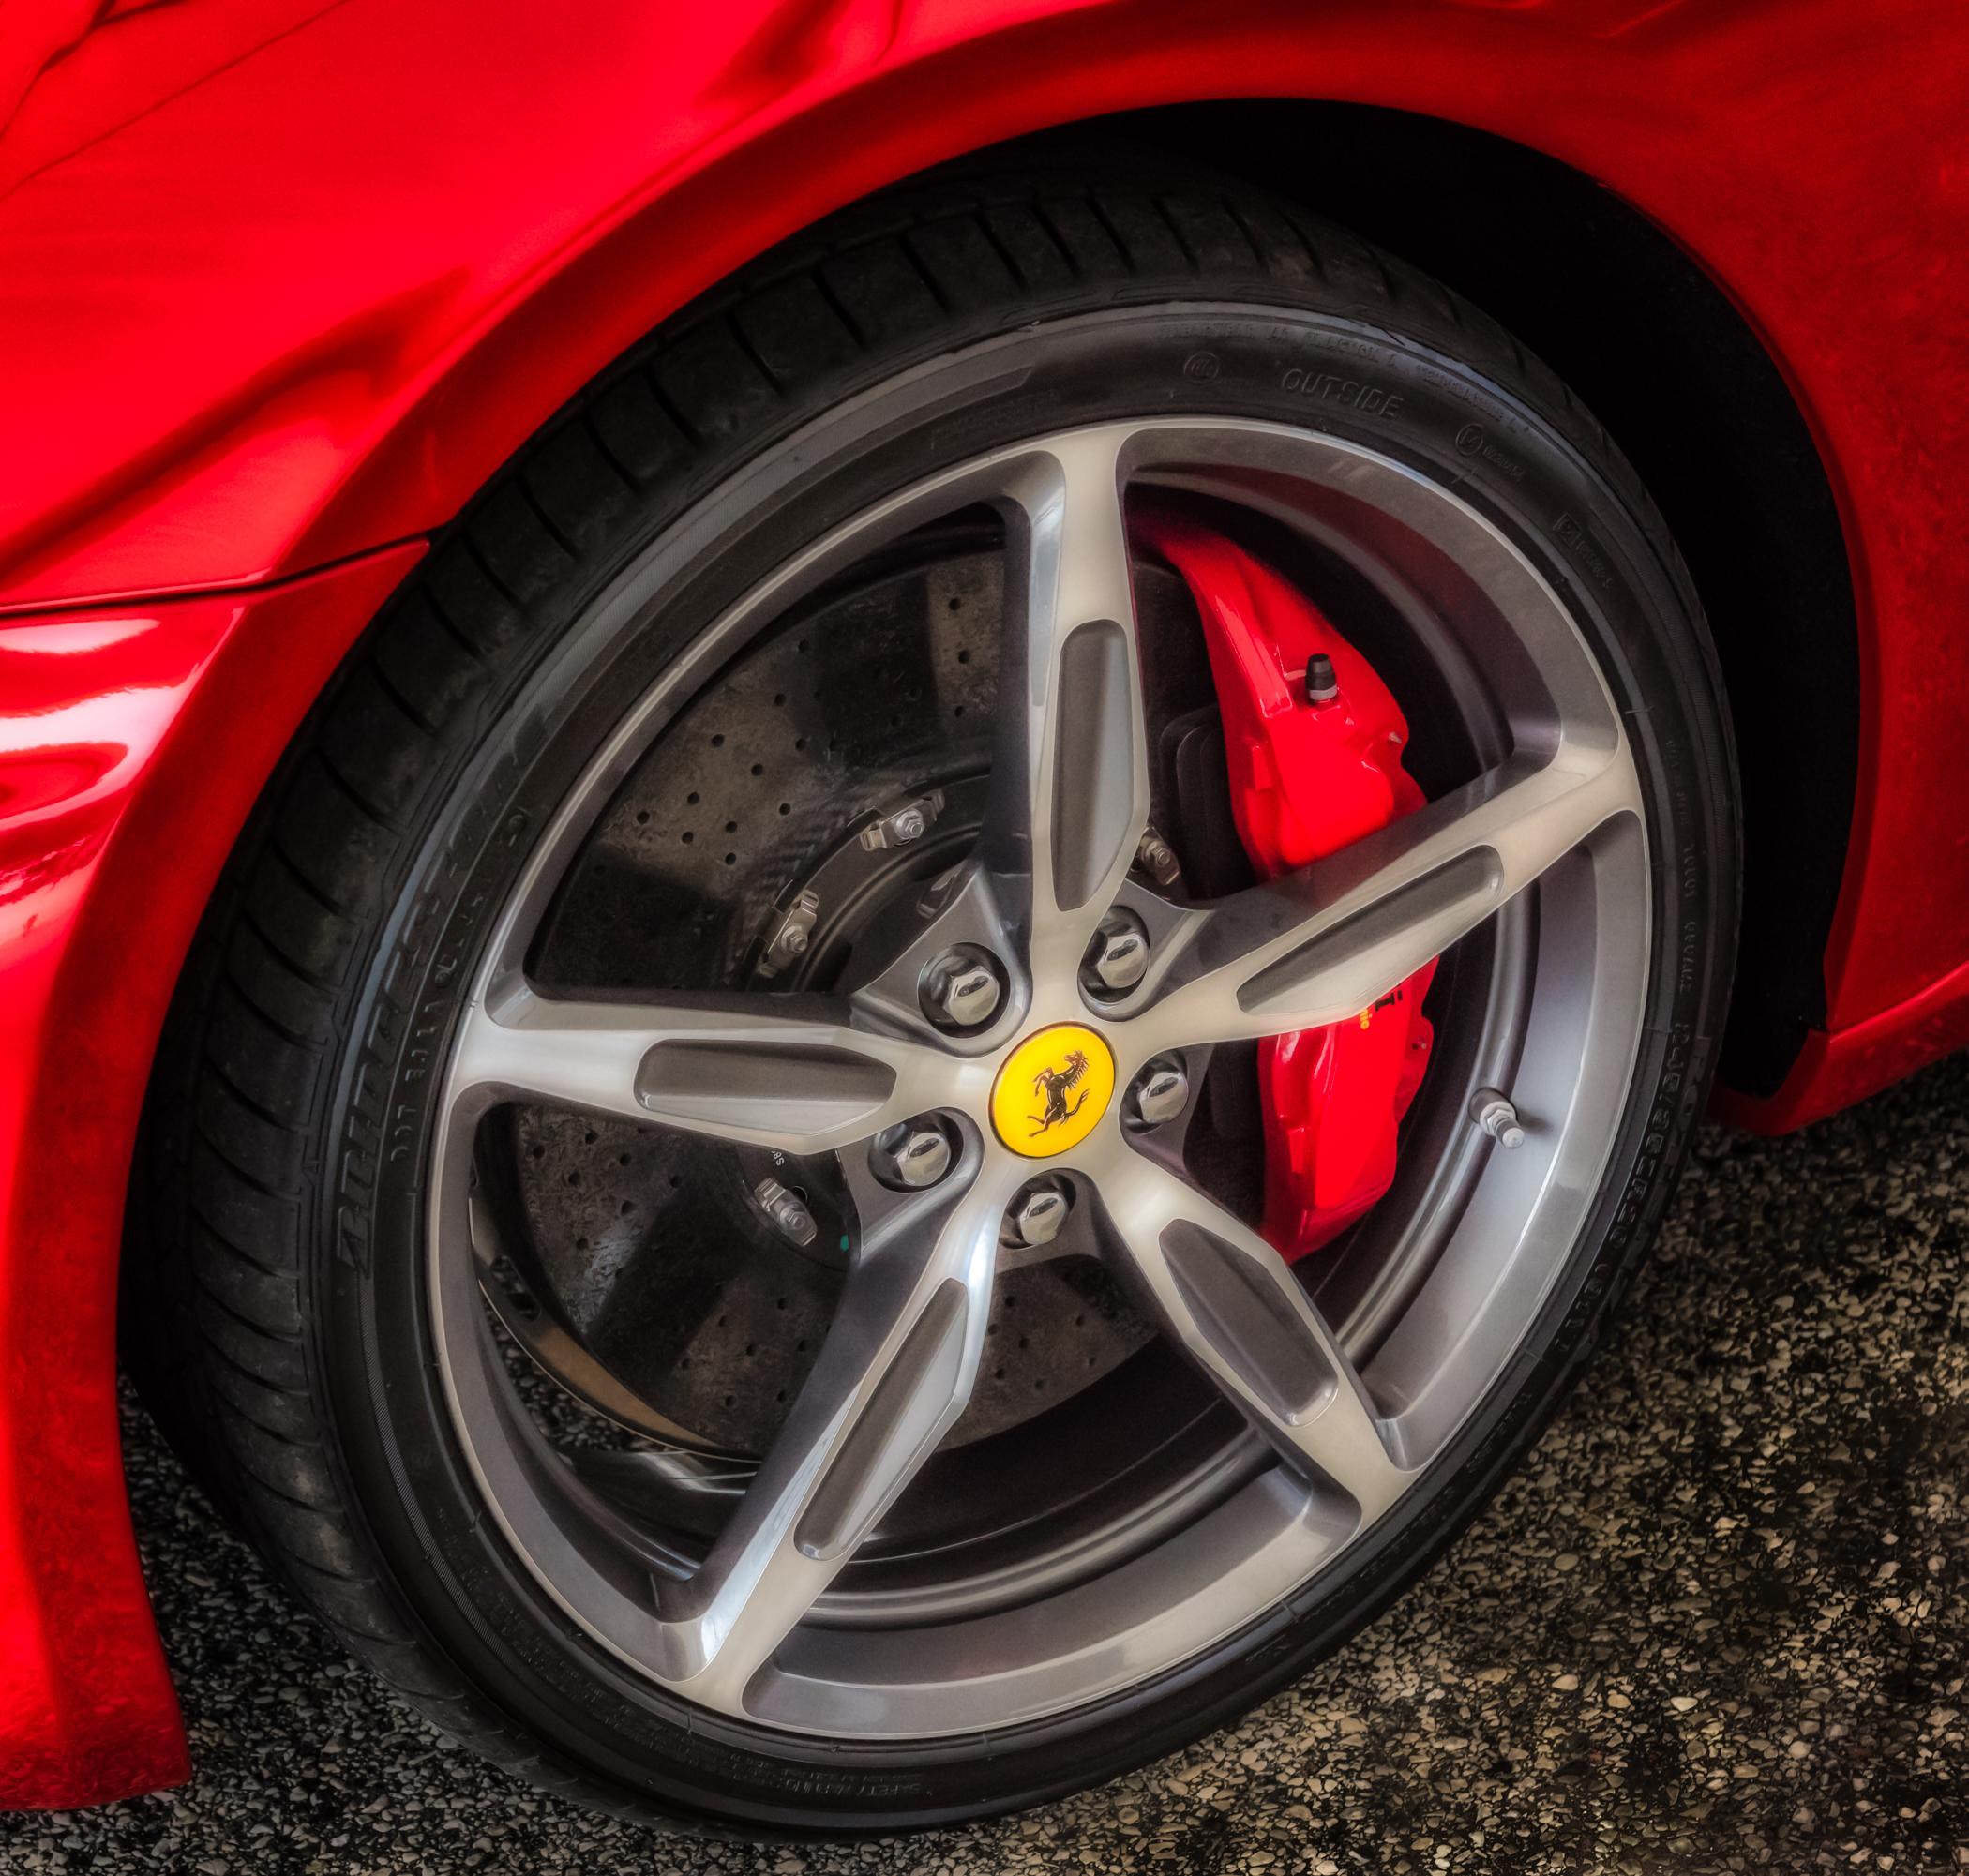 Ferrari Tire 2